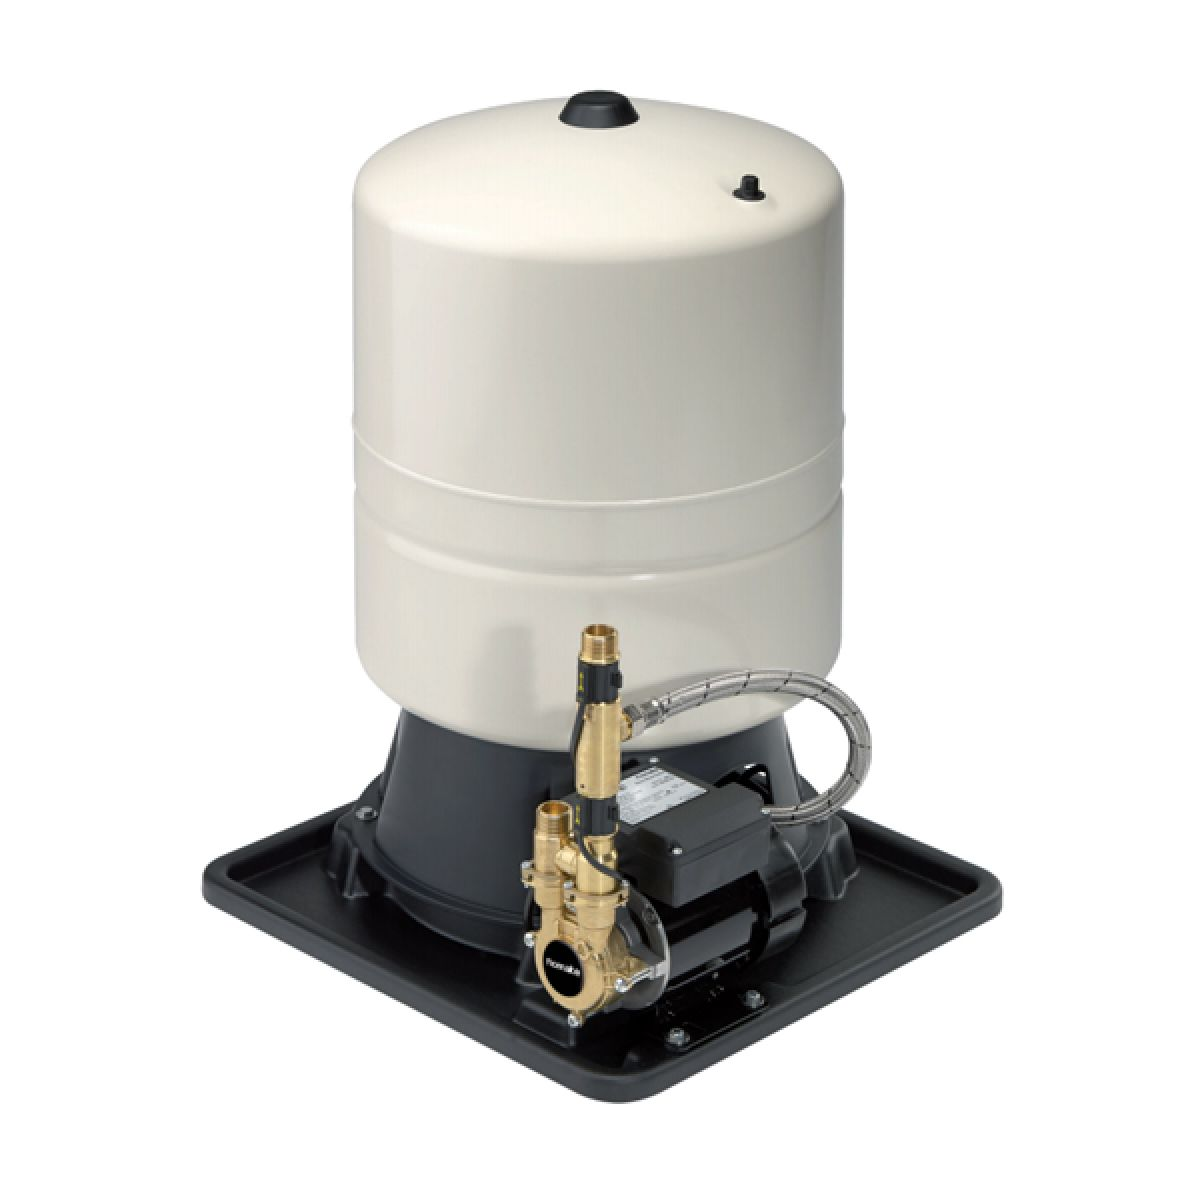 Stuart Turner 46634 Mainsboost Flomate MBF 80 3.2 Bar Pump